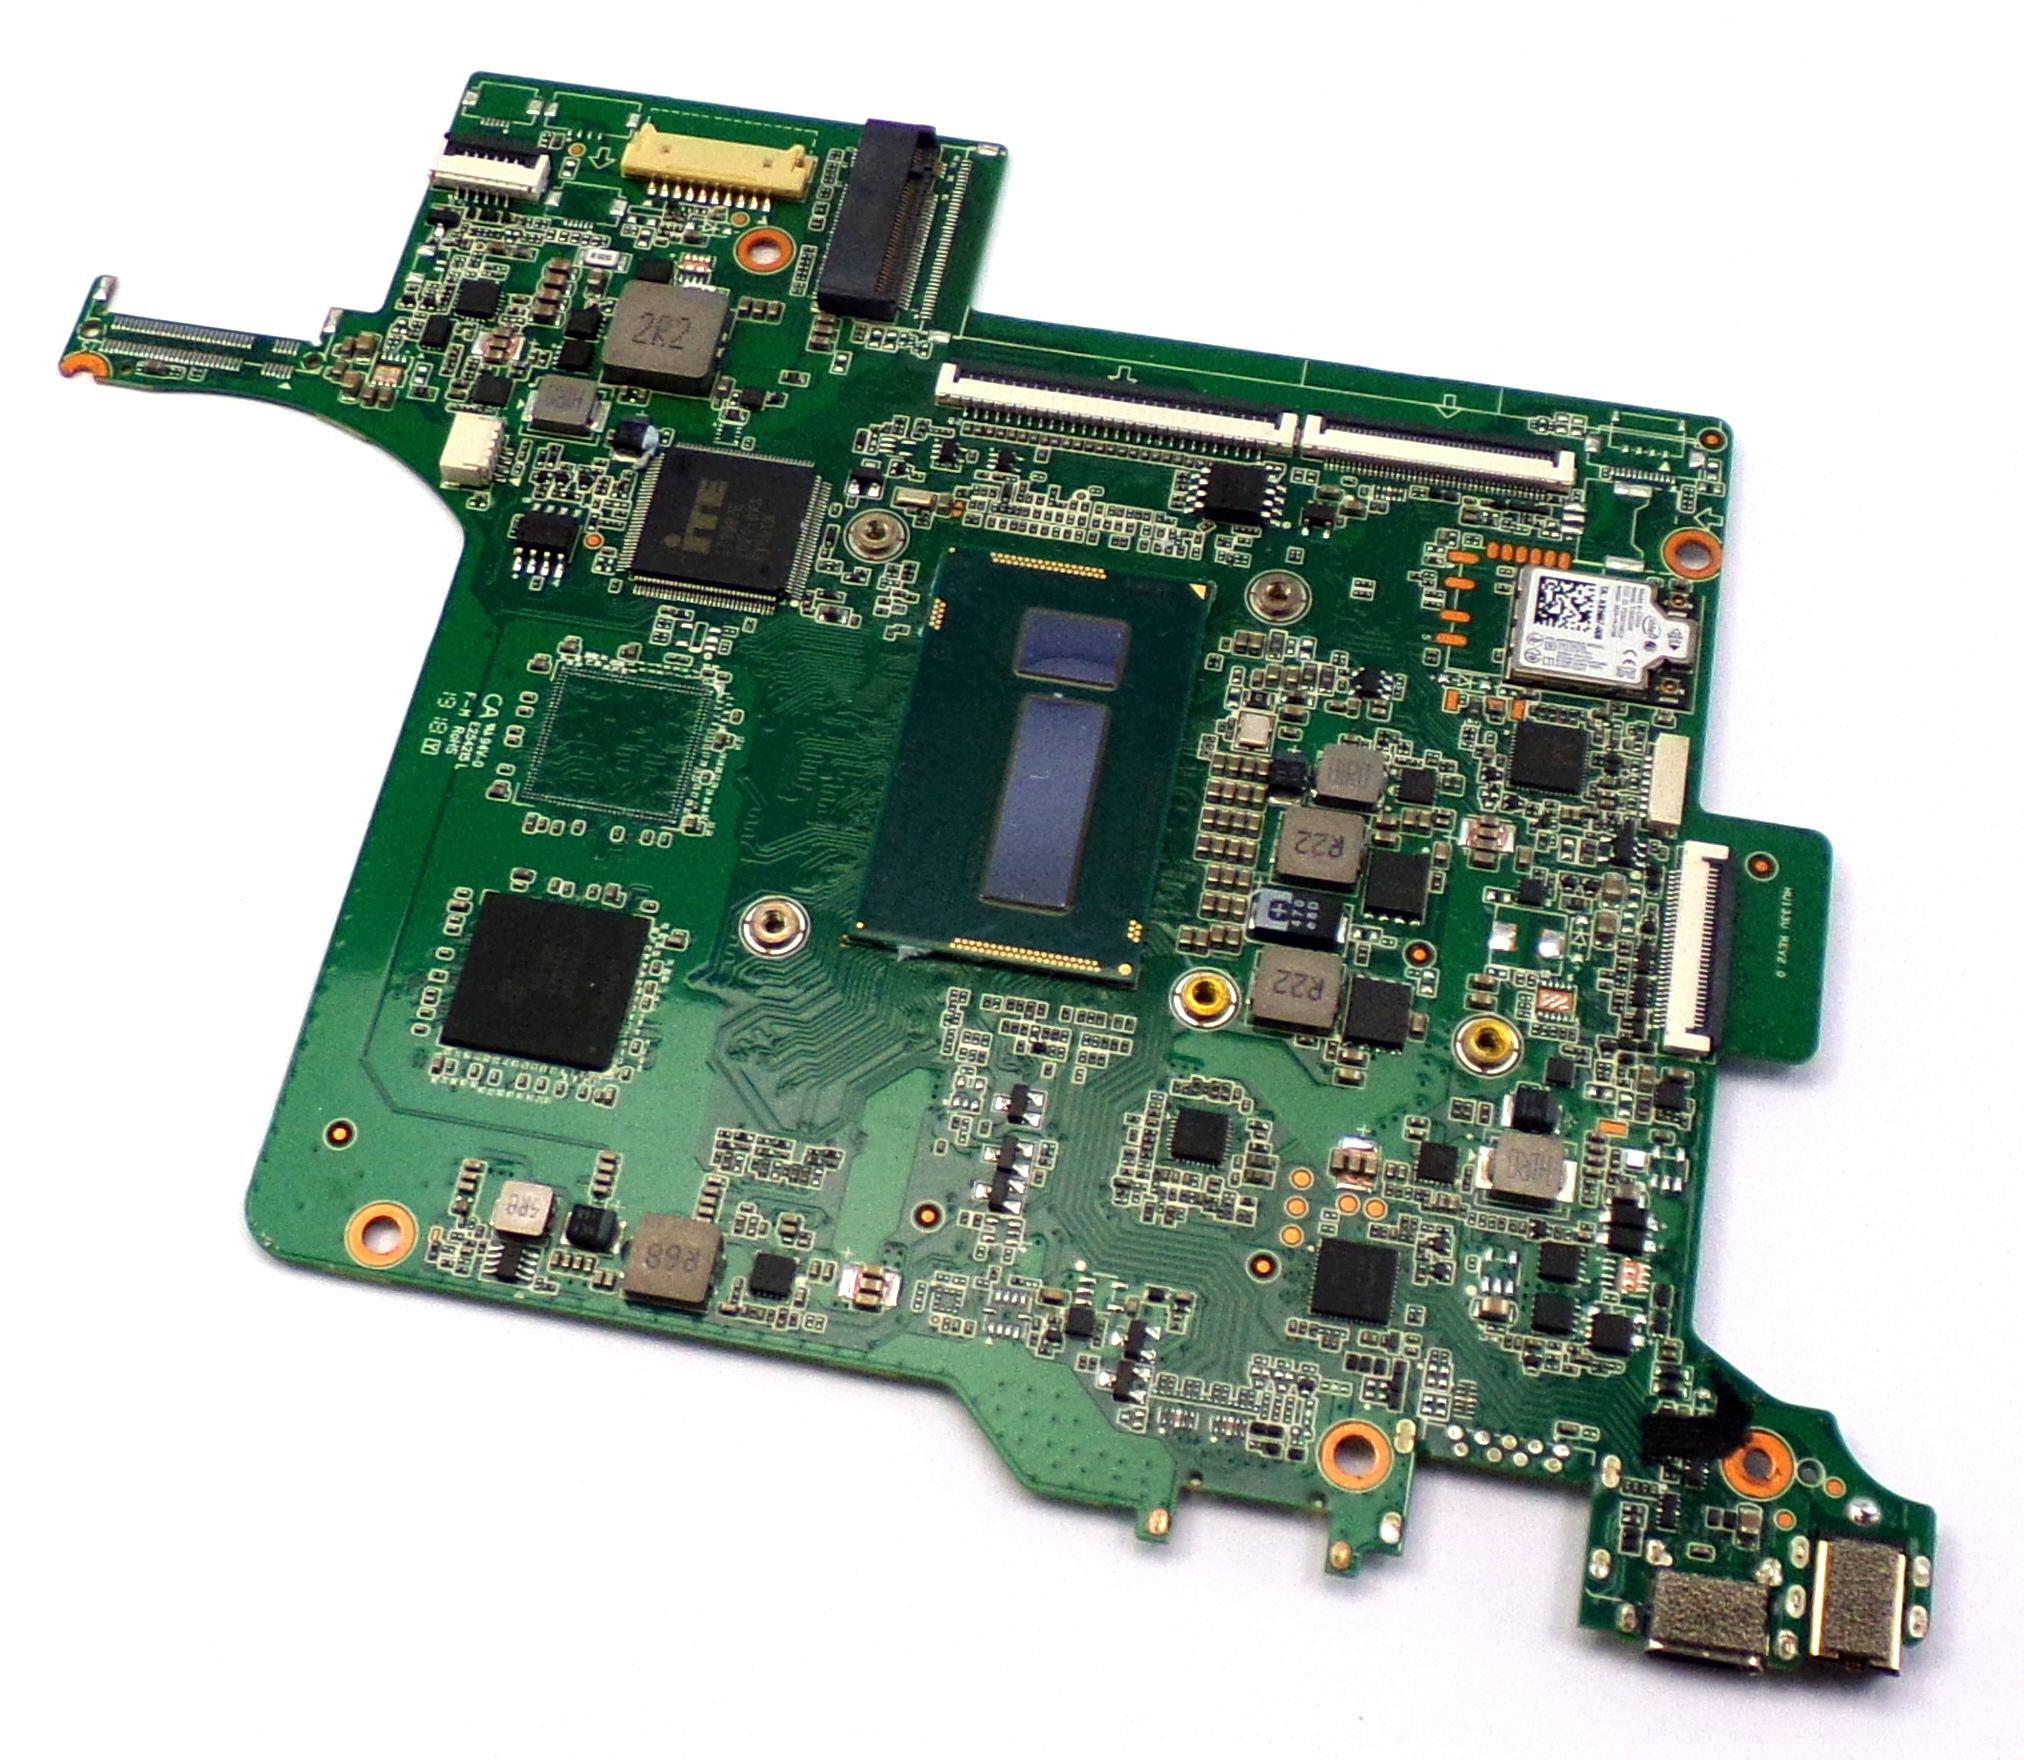 HU133UR200 GeoBook 3Si with Intel i3-5005U 128GB eMMC Laptop Motherboard